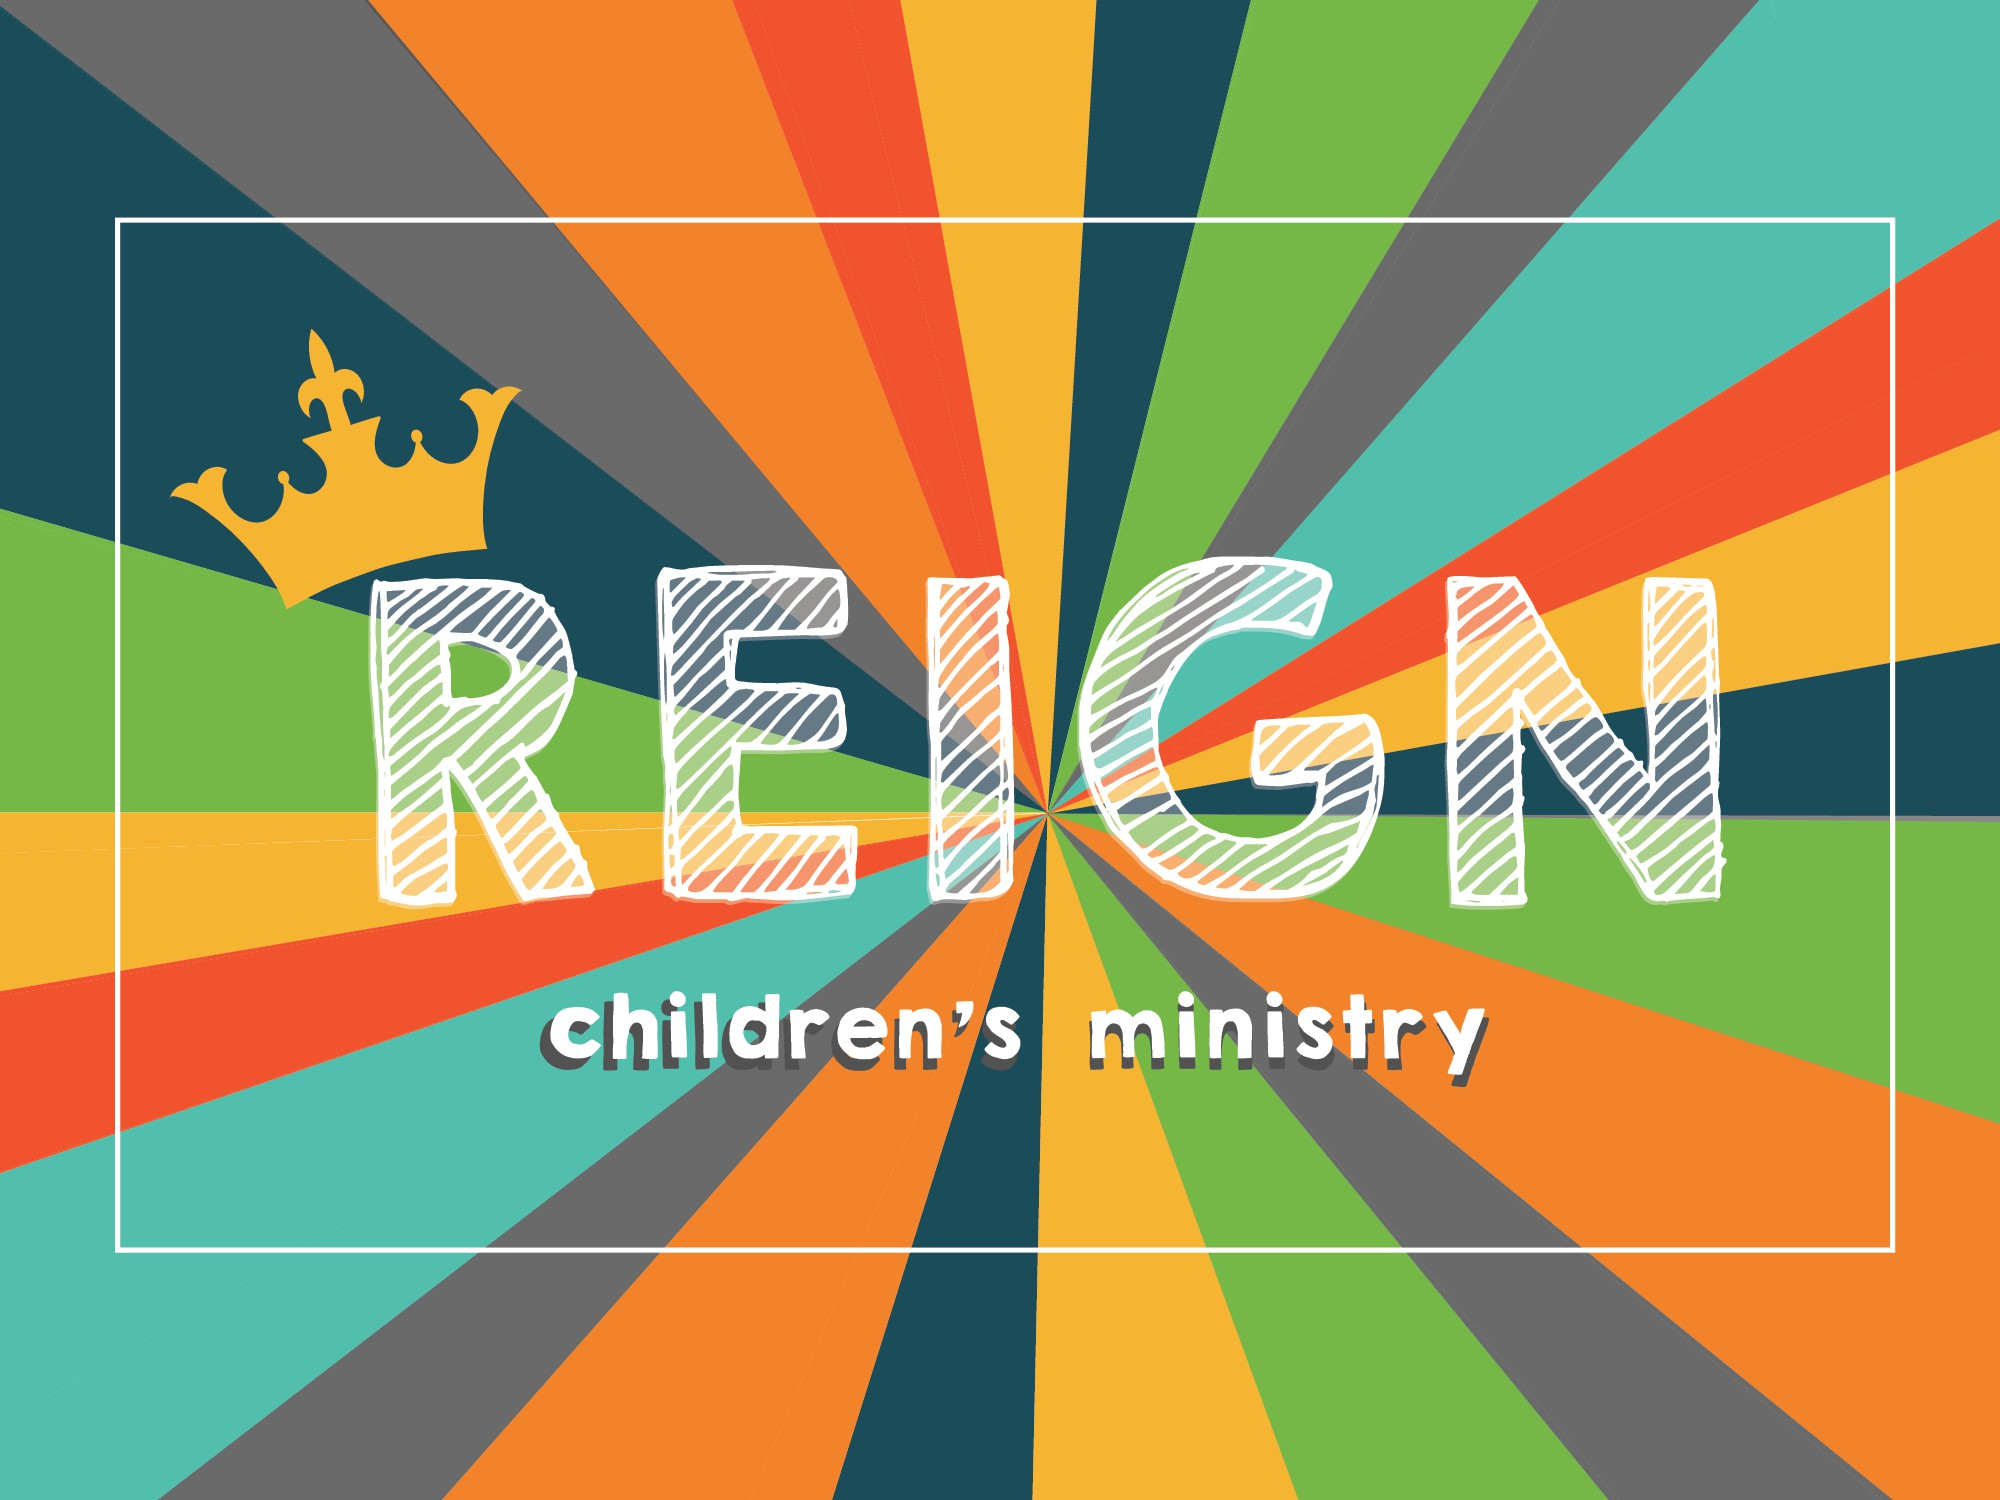 REIGN Children's Ministry